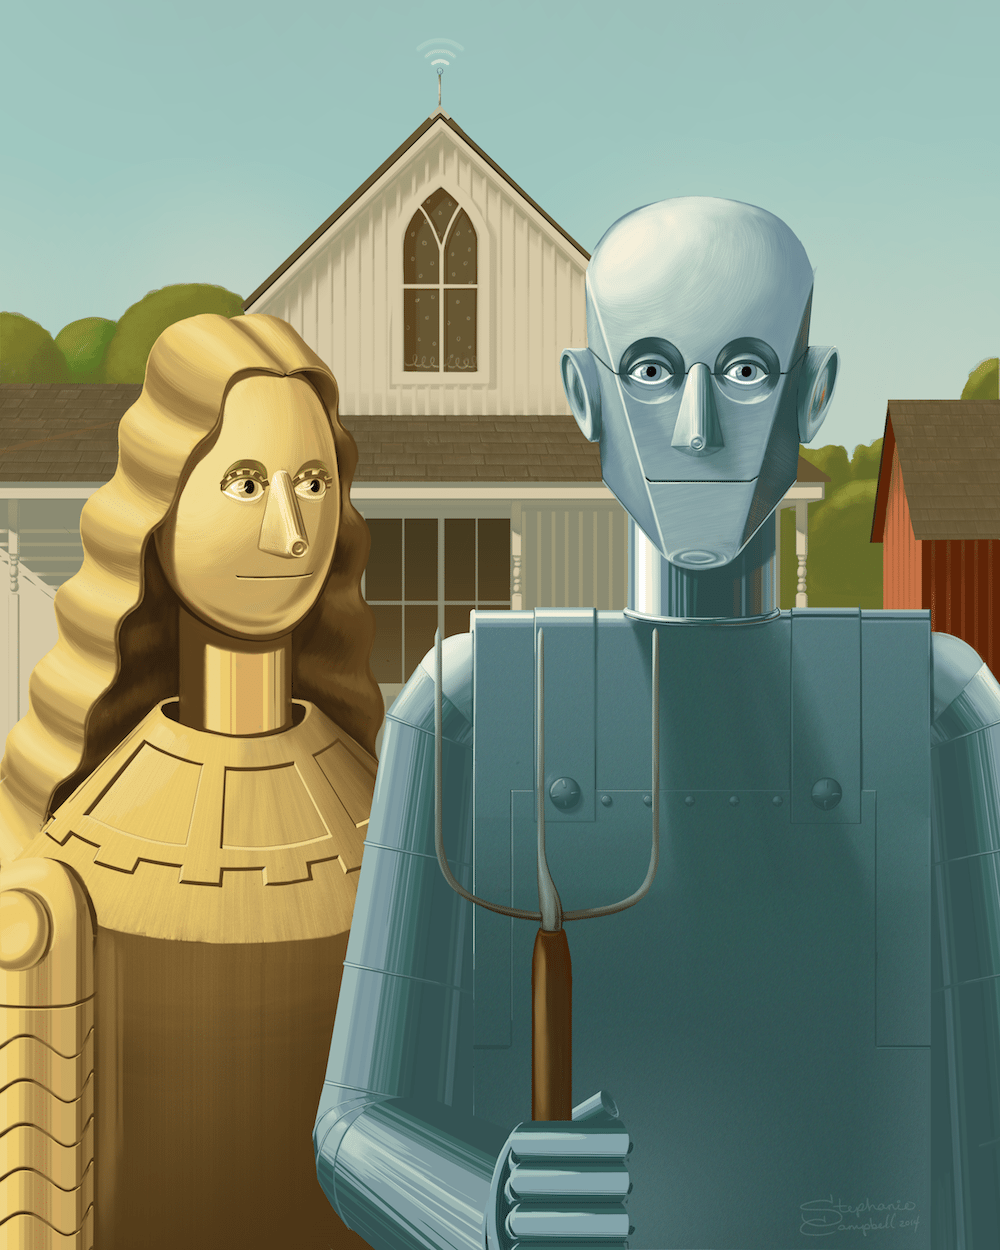 American Gothic Robots by Stephanie Campbell via ArtCorgi